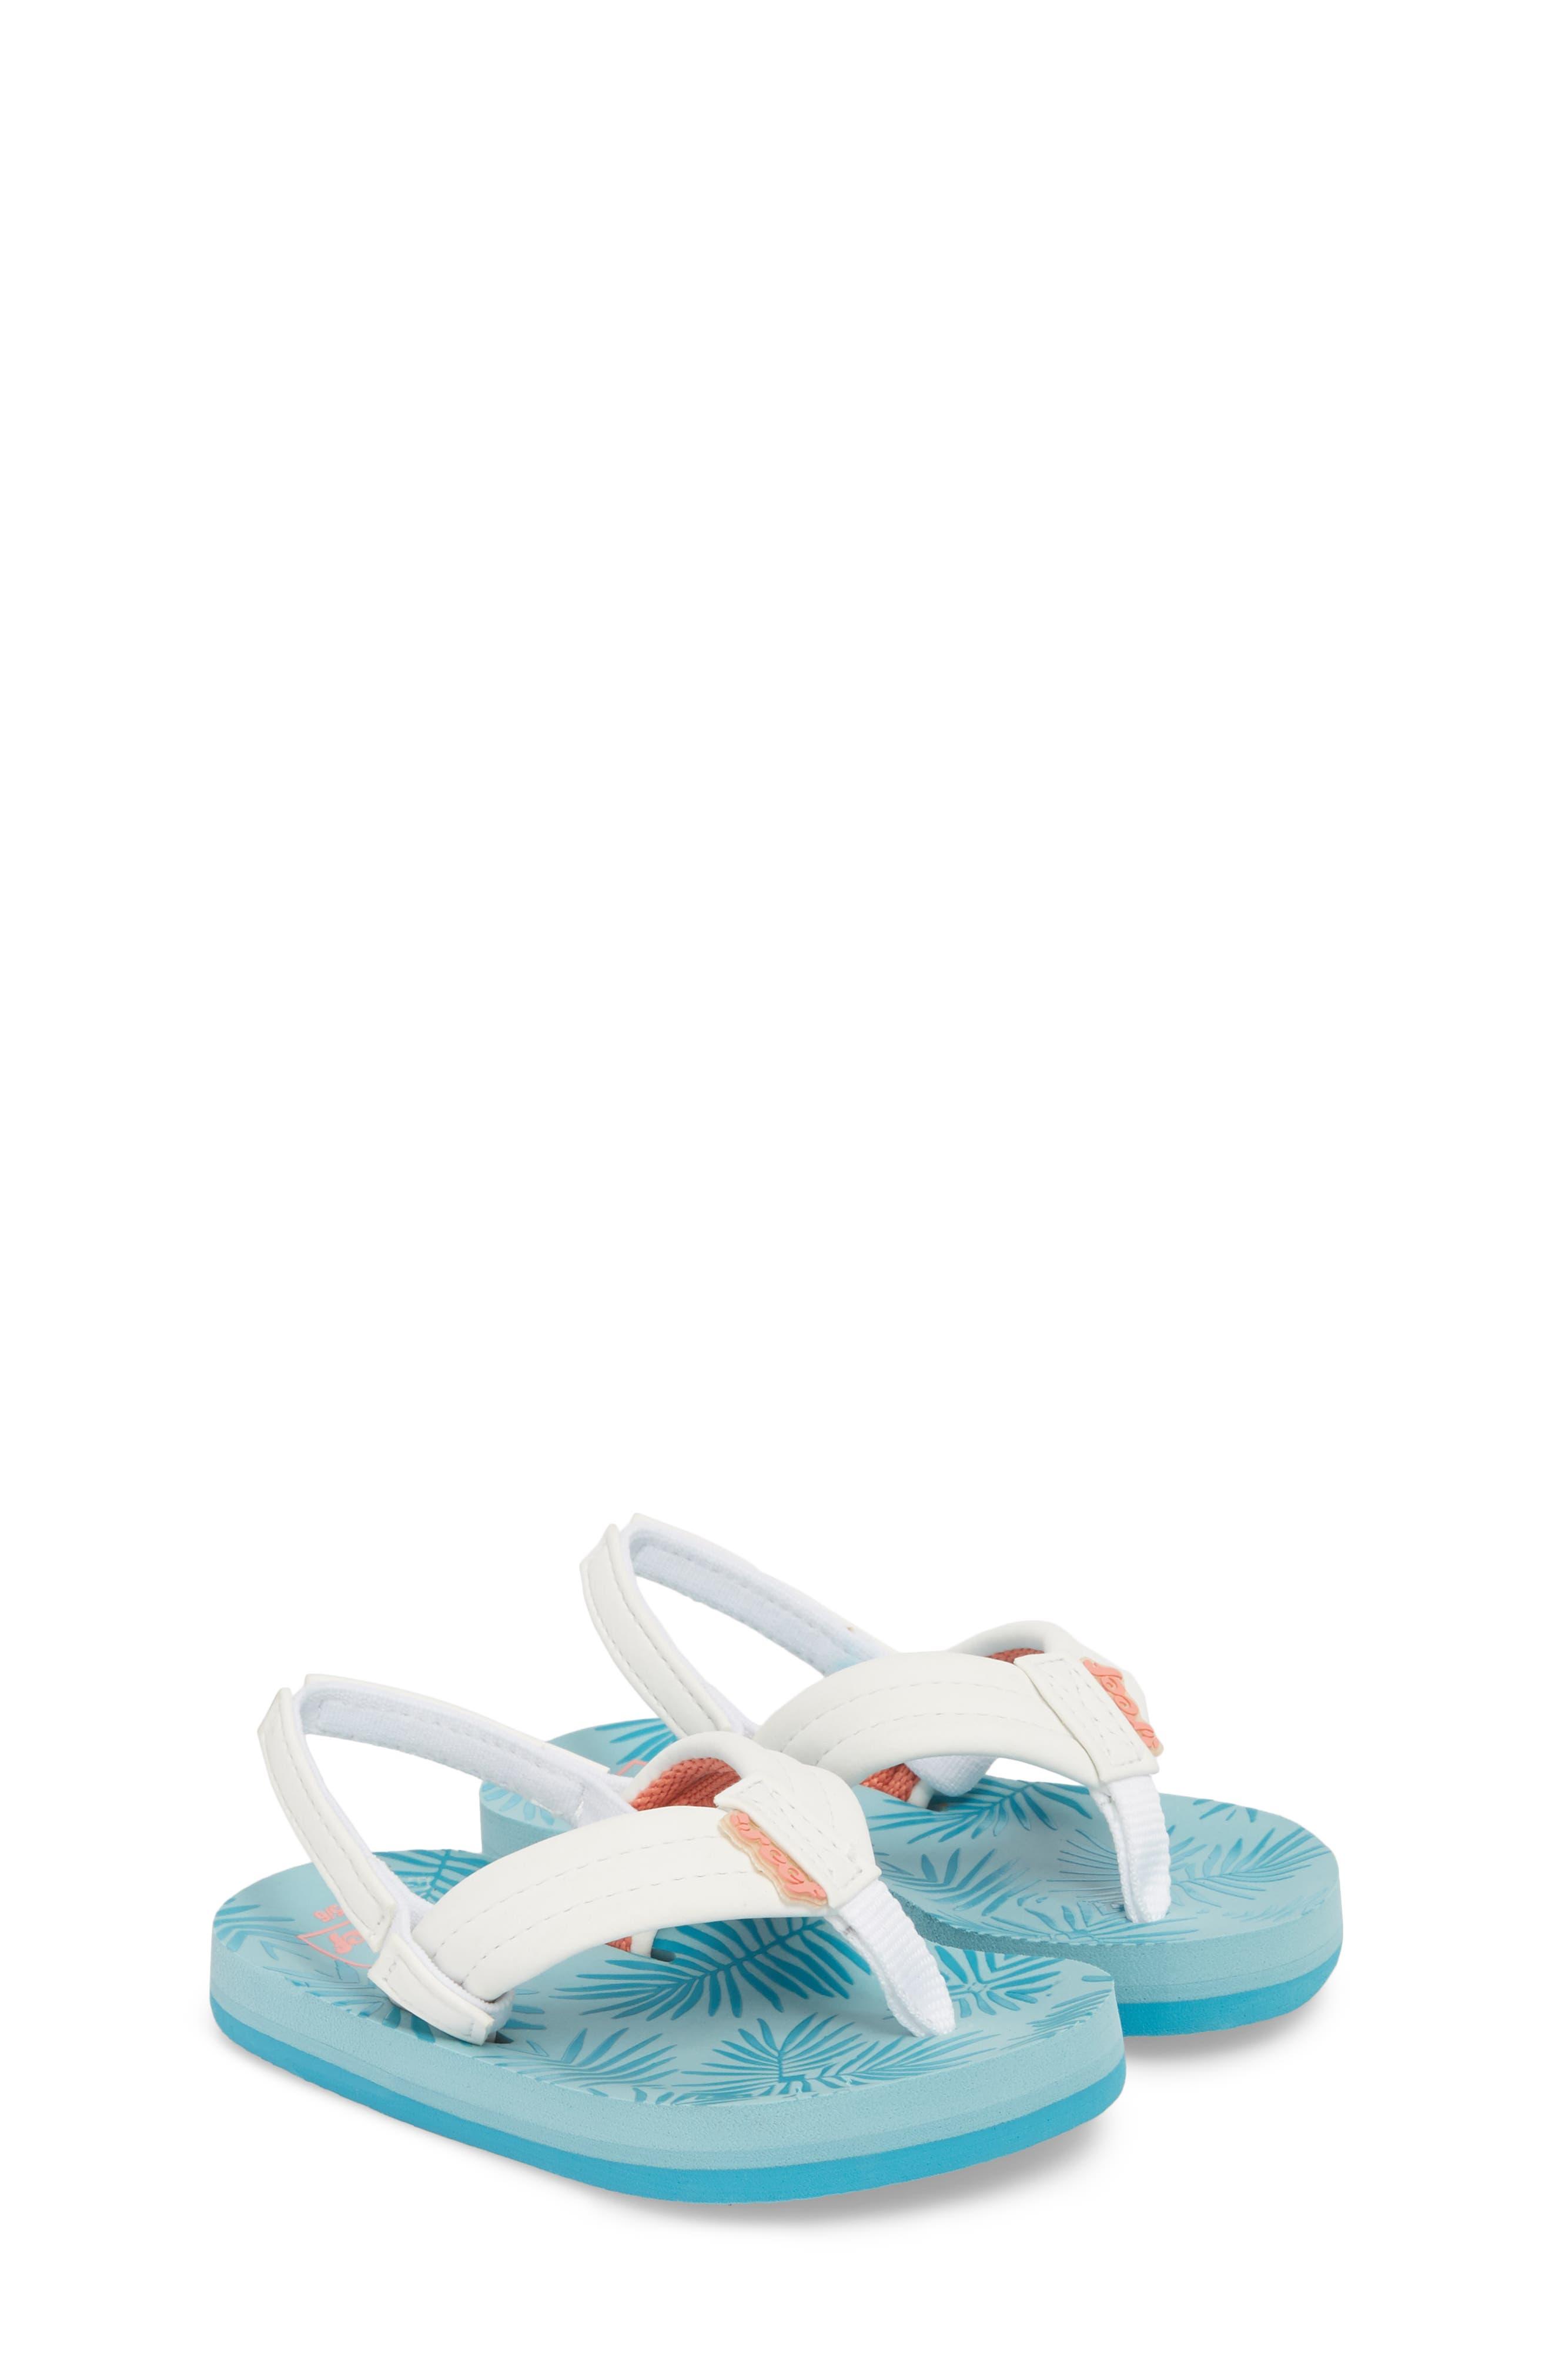 Little Reef Footprints Sandal,                             Alternate thumbnail 3, color,                             Blue